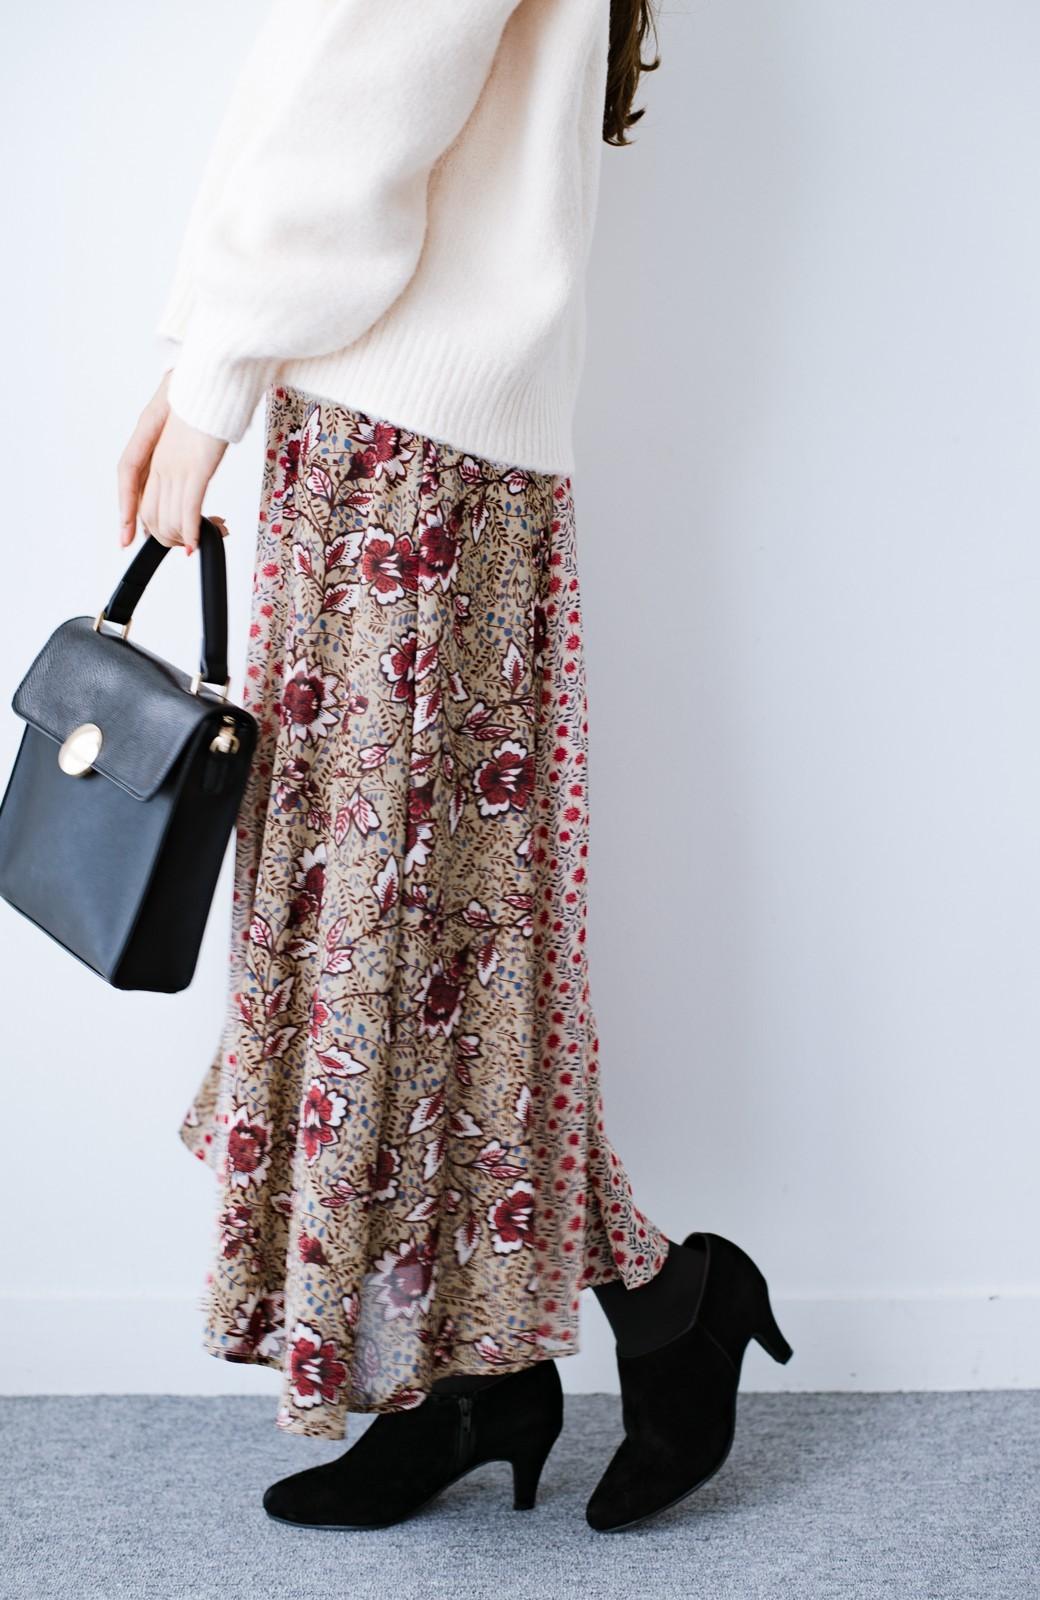 haco! 【洗濯機洗いOK】シンプルなトップスに合わせるだけでかわいくなれる MIX柄スカート <ベージュ系その他>の商品写真4